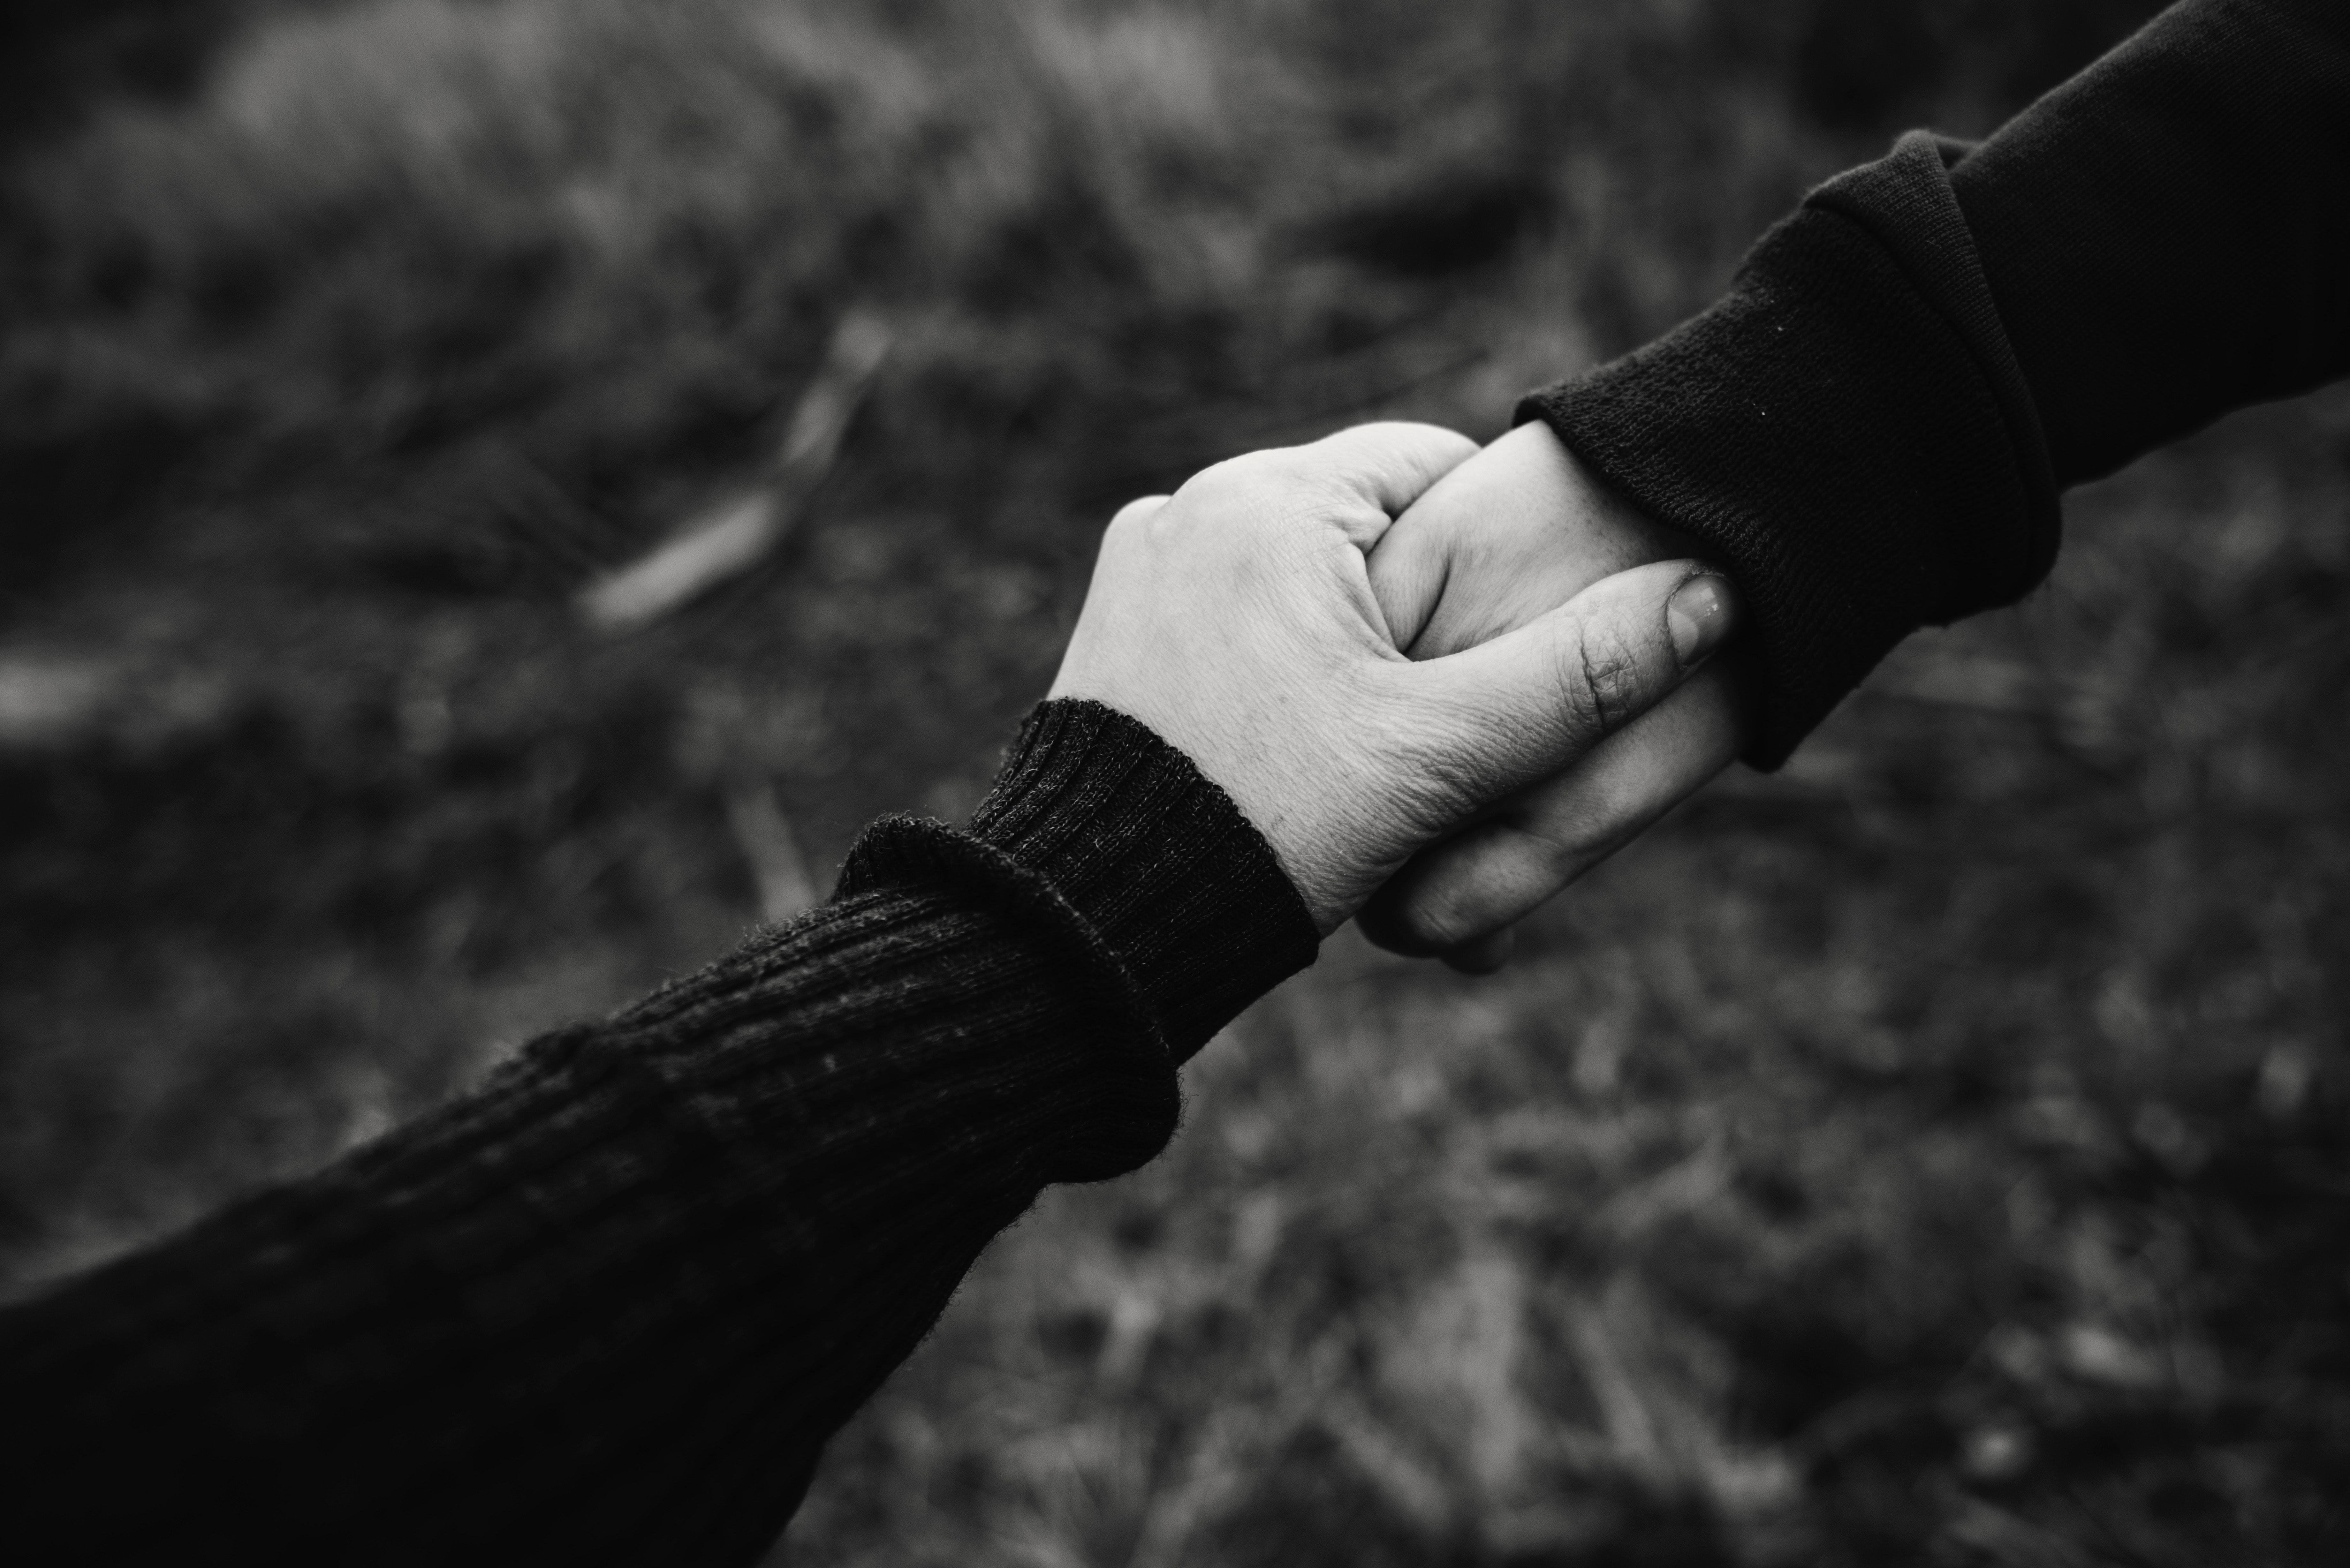 adult-black-and-white-blur-735978.jpg